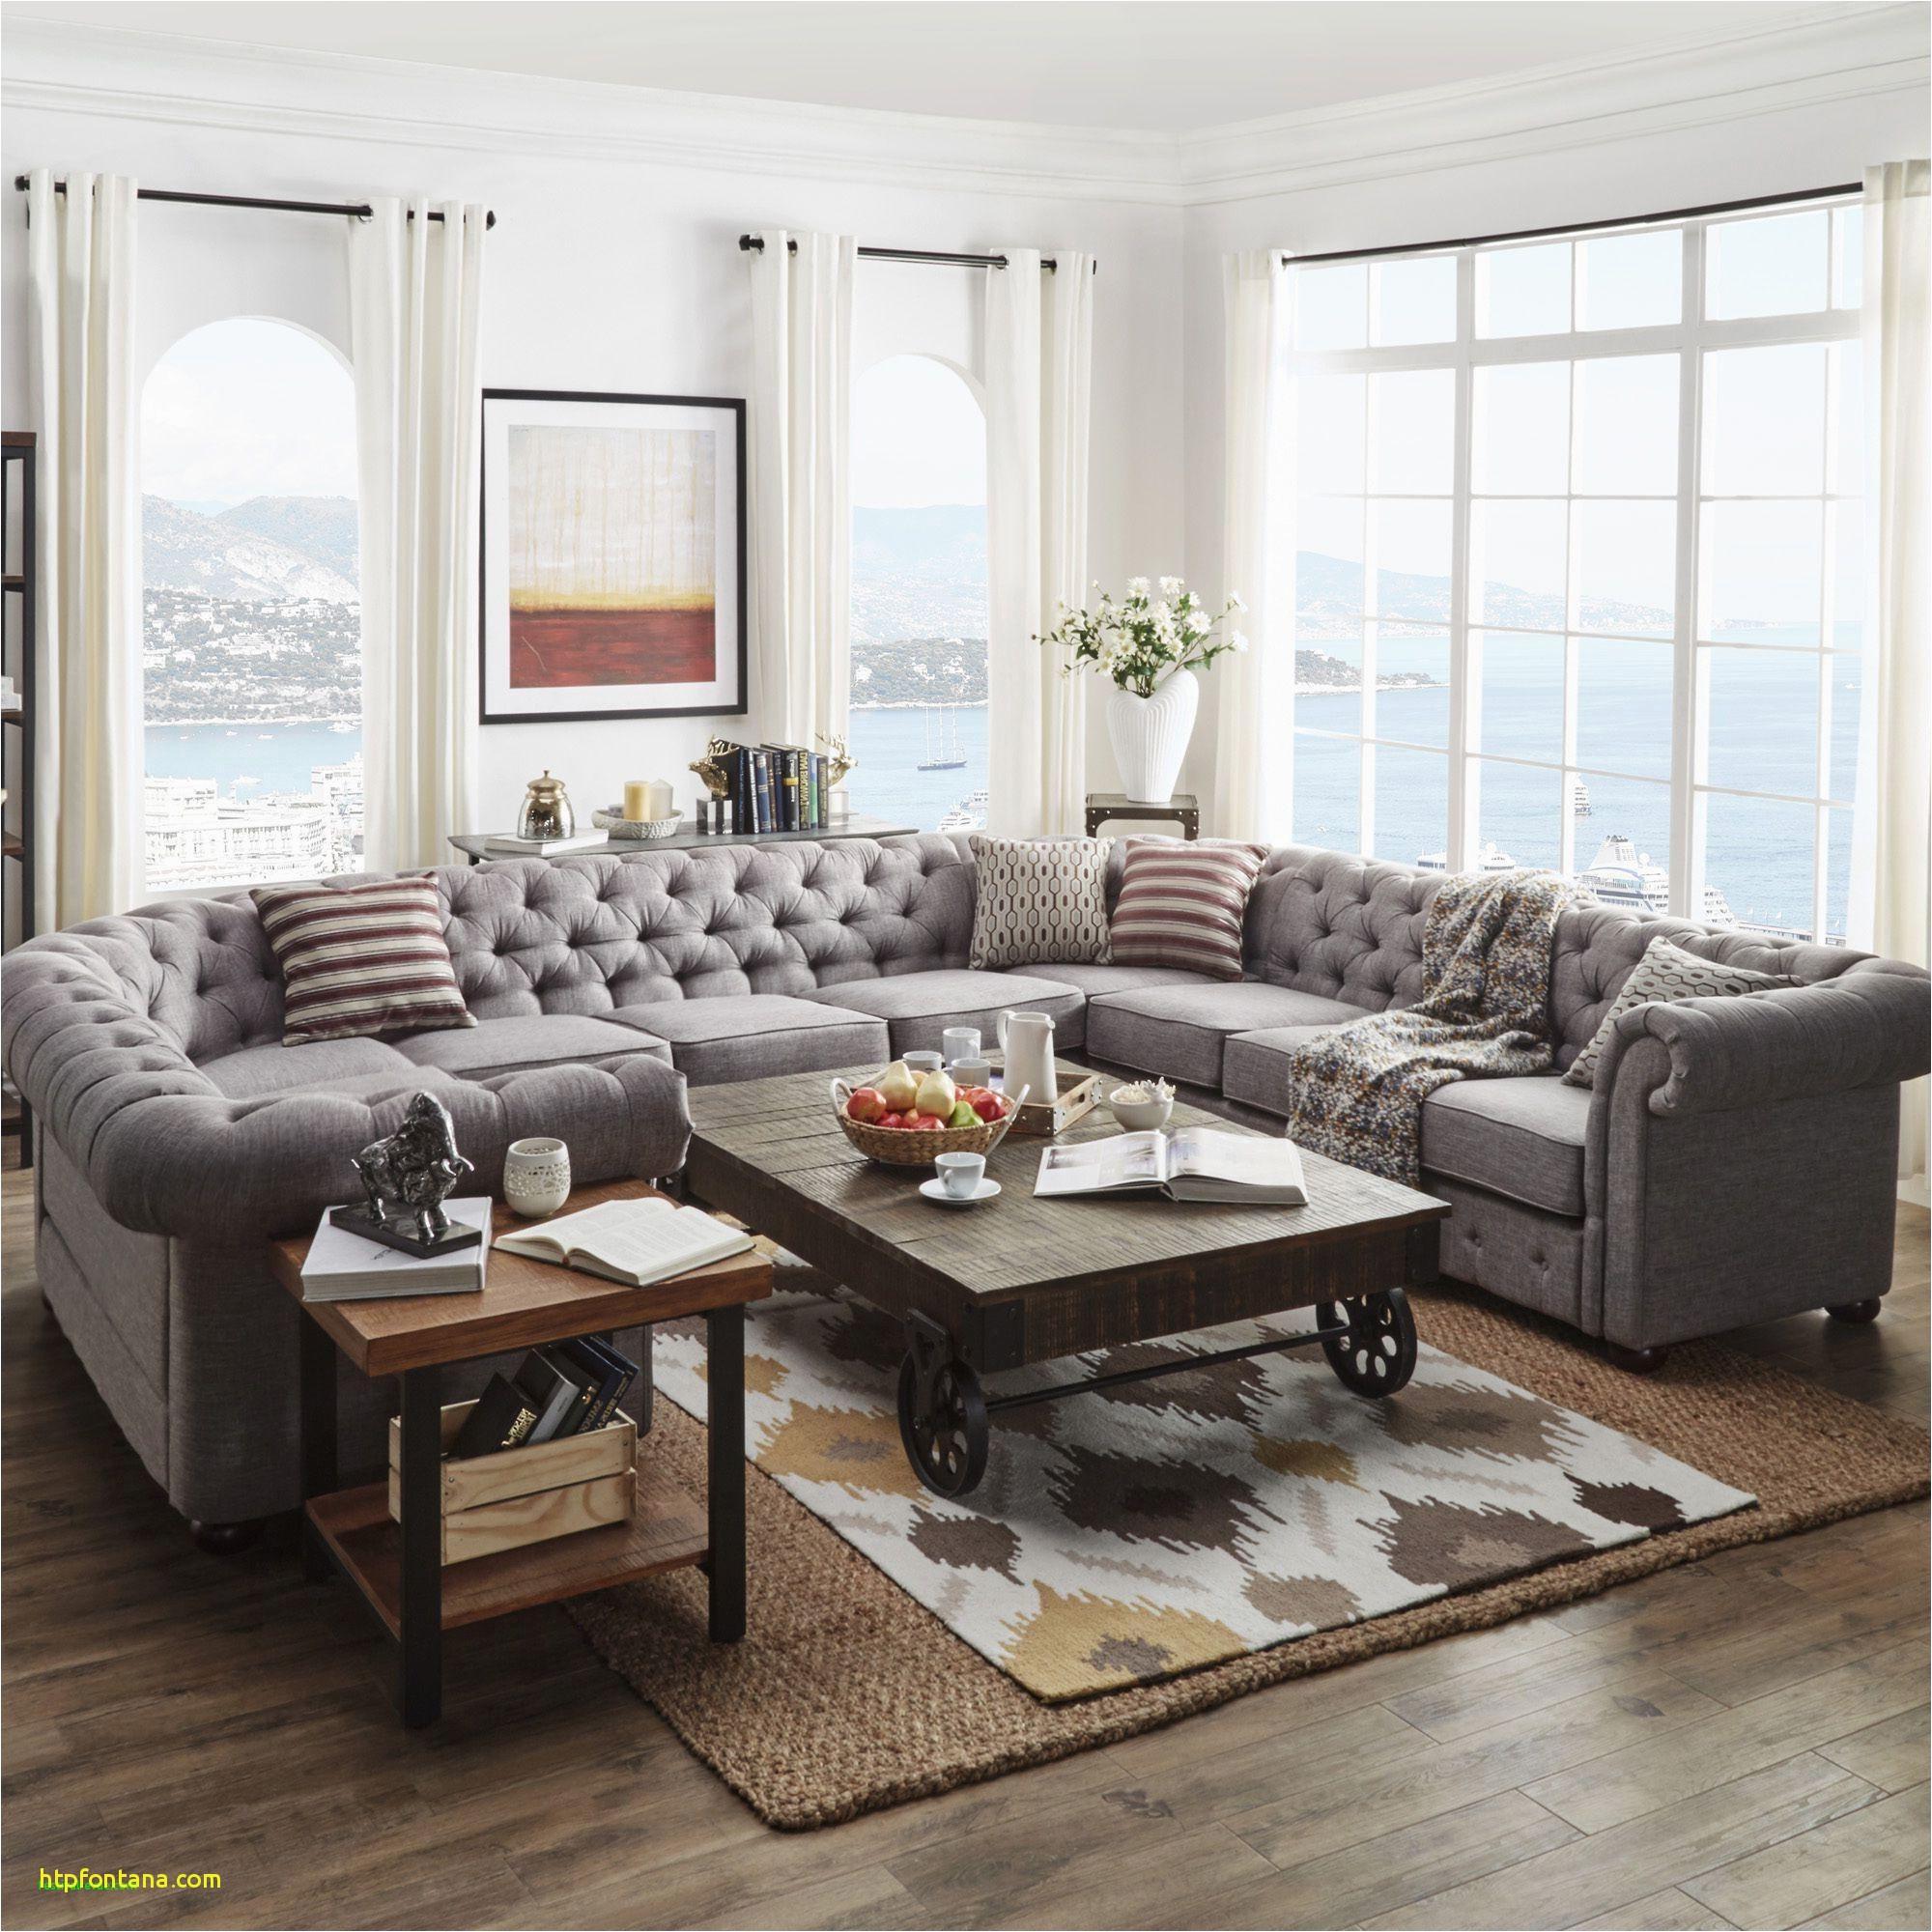 full size of furniture loveseat sofa elegant furniture fabulous new tufted loveseat tufted loveseat 0d size